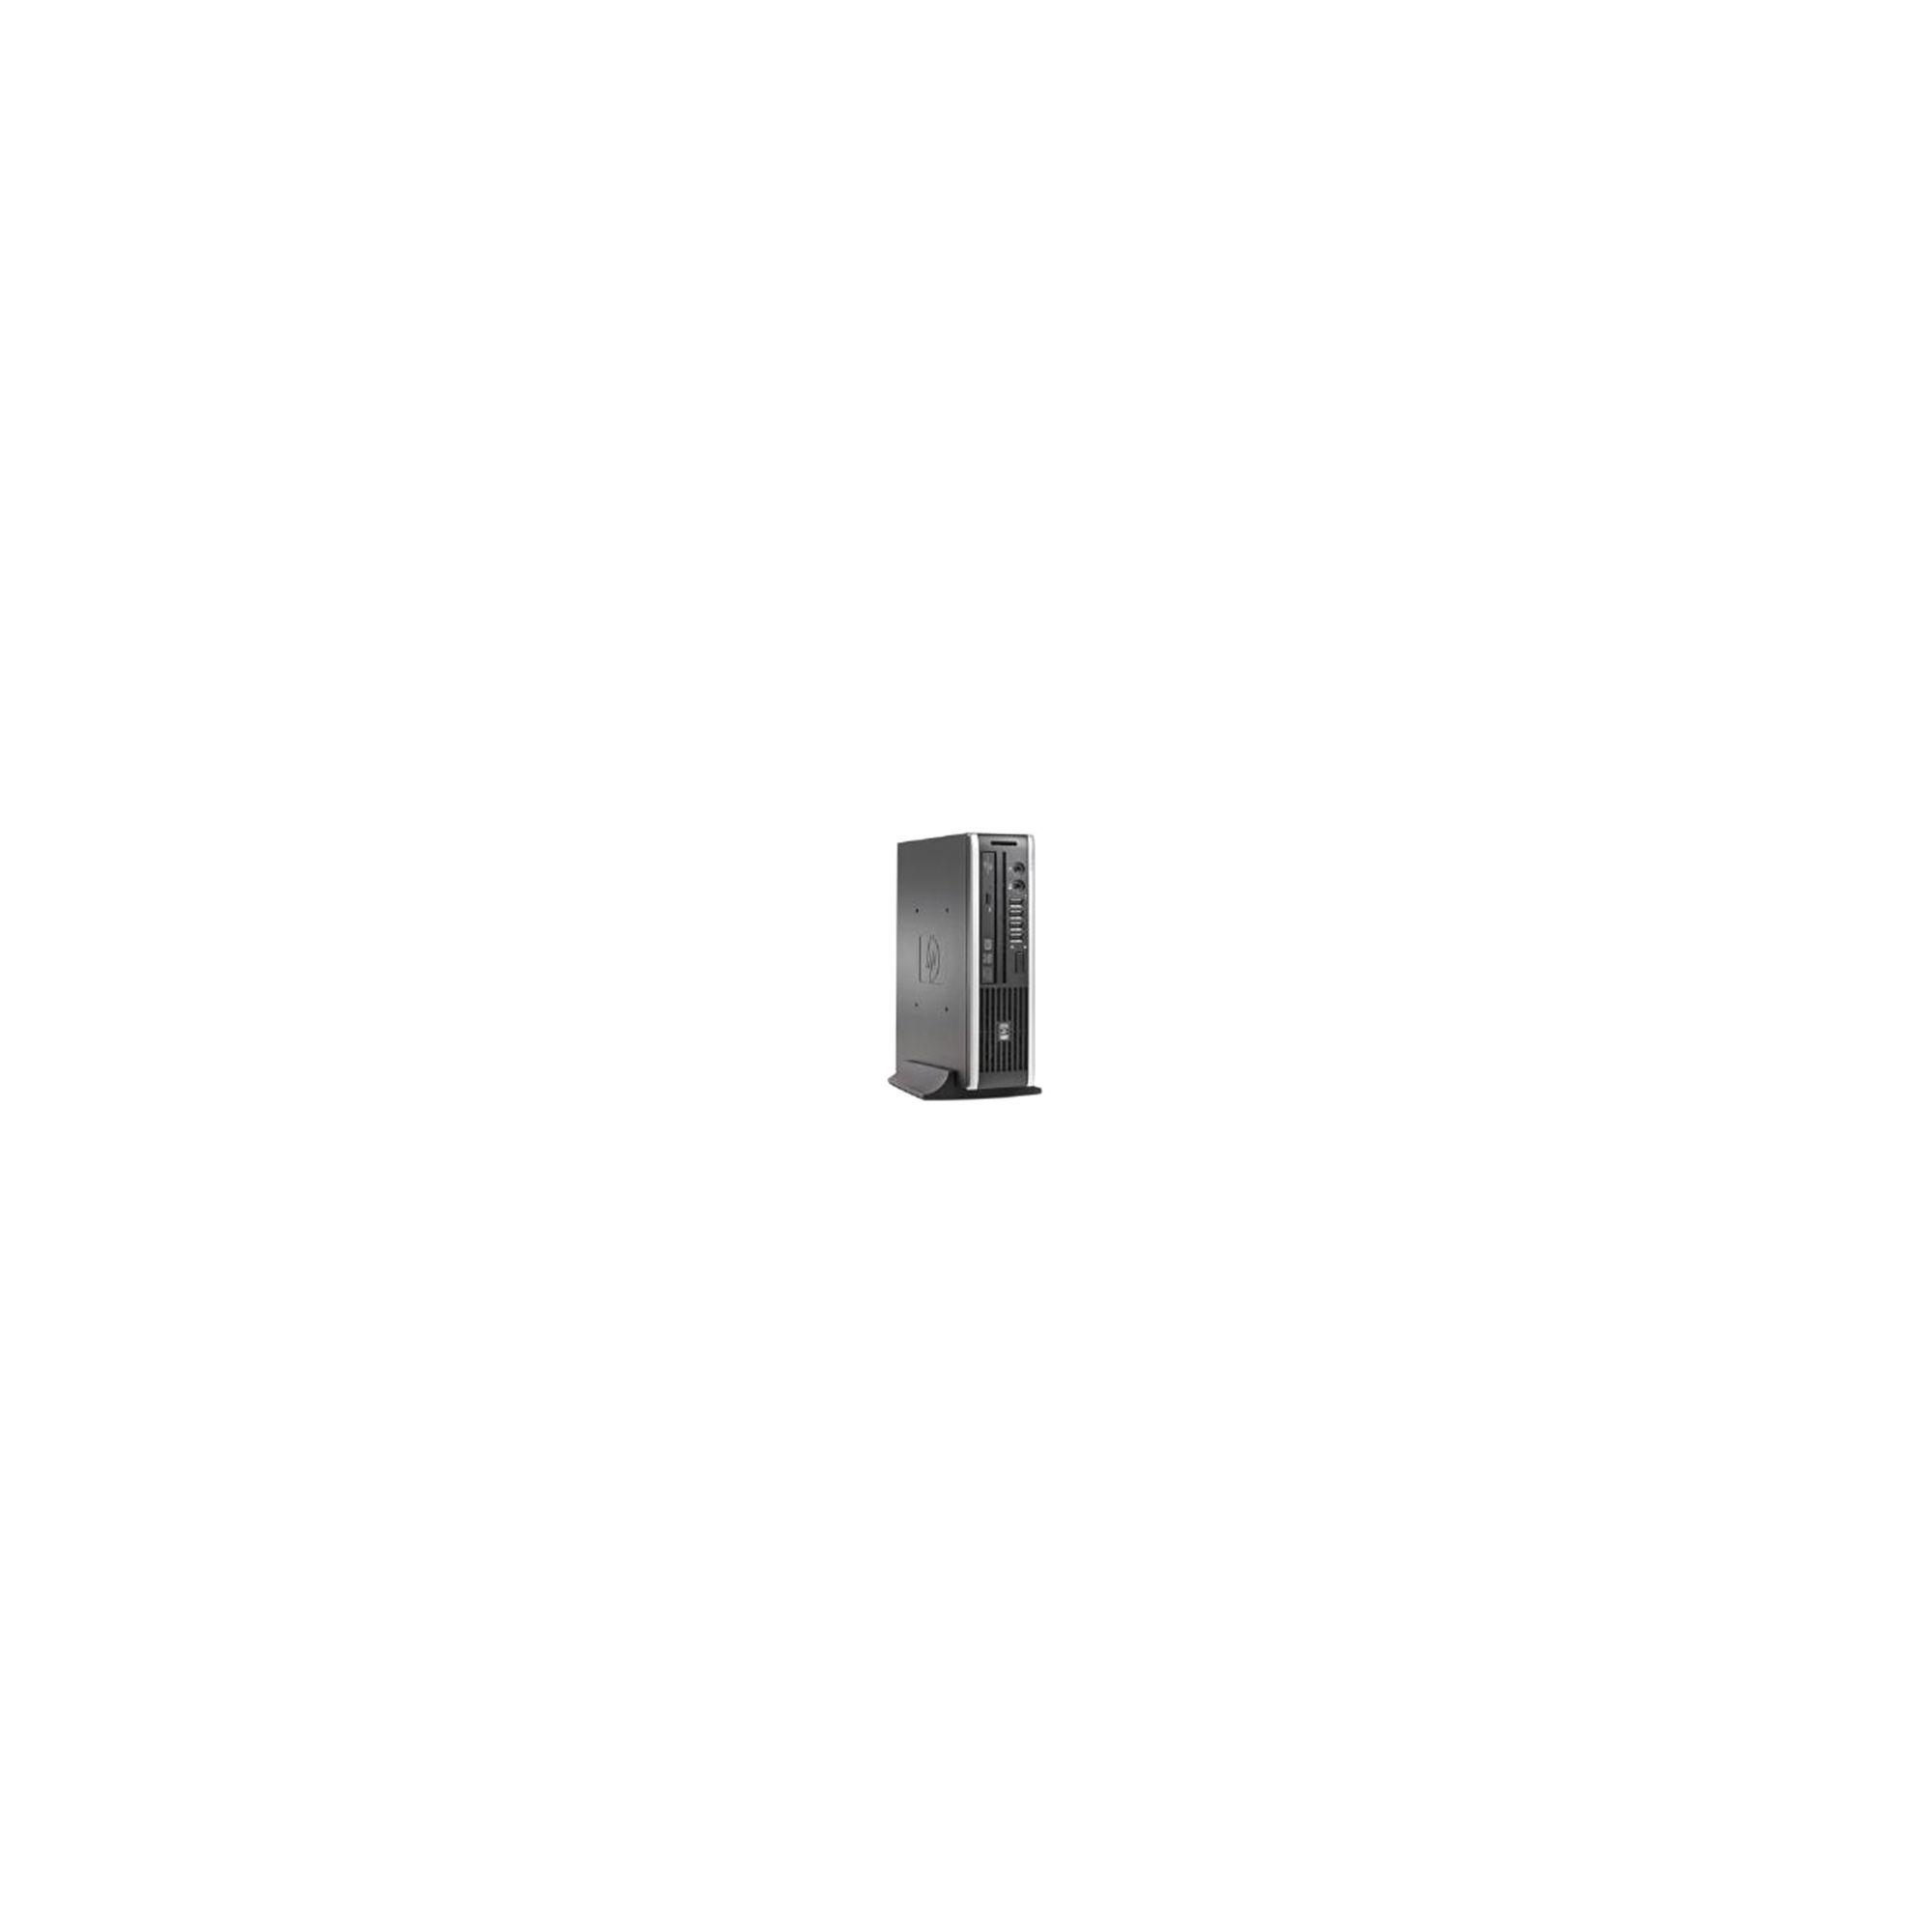 Compaq 8300 Elite Ultra-Slim Desktop PC Core i3 (3220) 3.3GHz 4GB 500GB DVD Writer SM LAN Windows 8 Pro 64-bit Downgradeable to Windows 7 Pro 64-bit